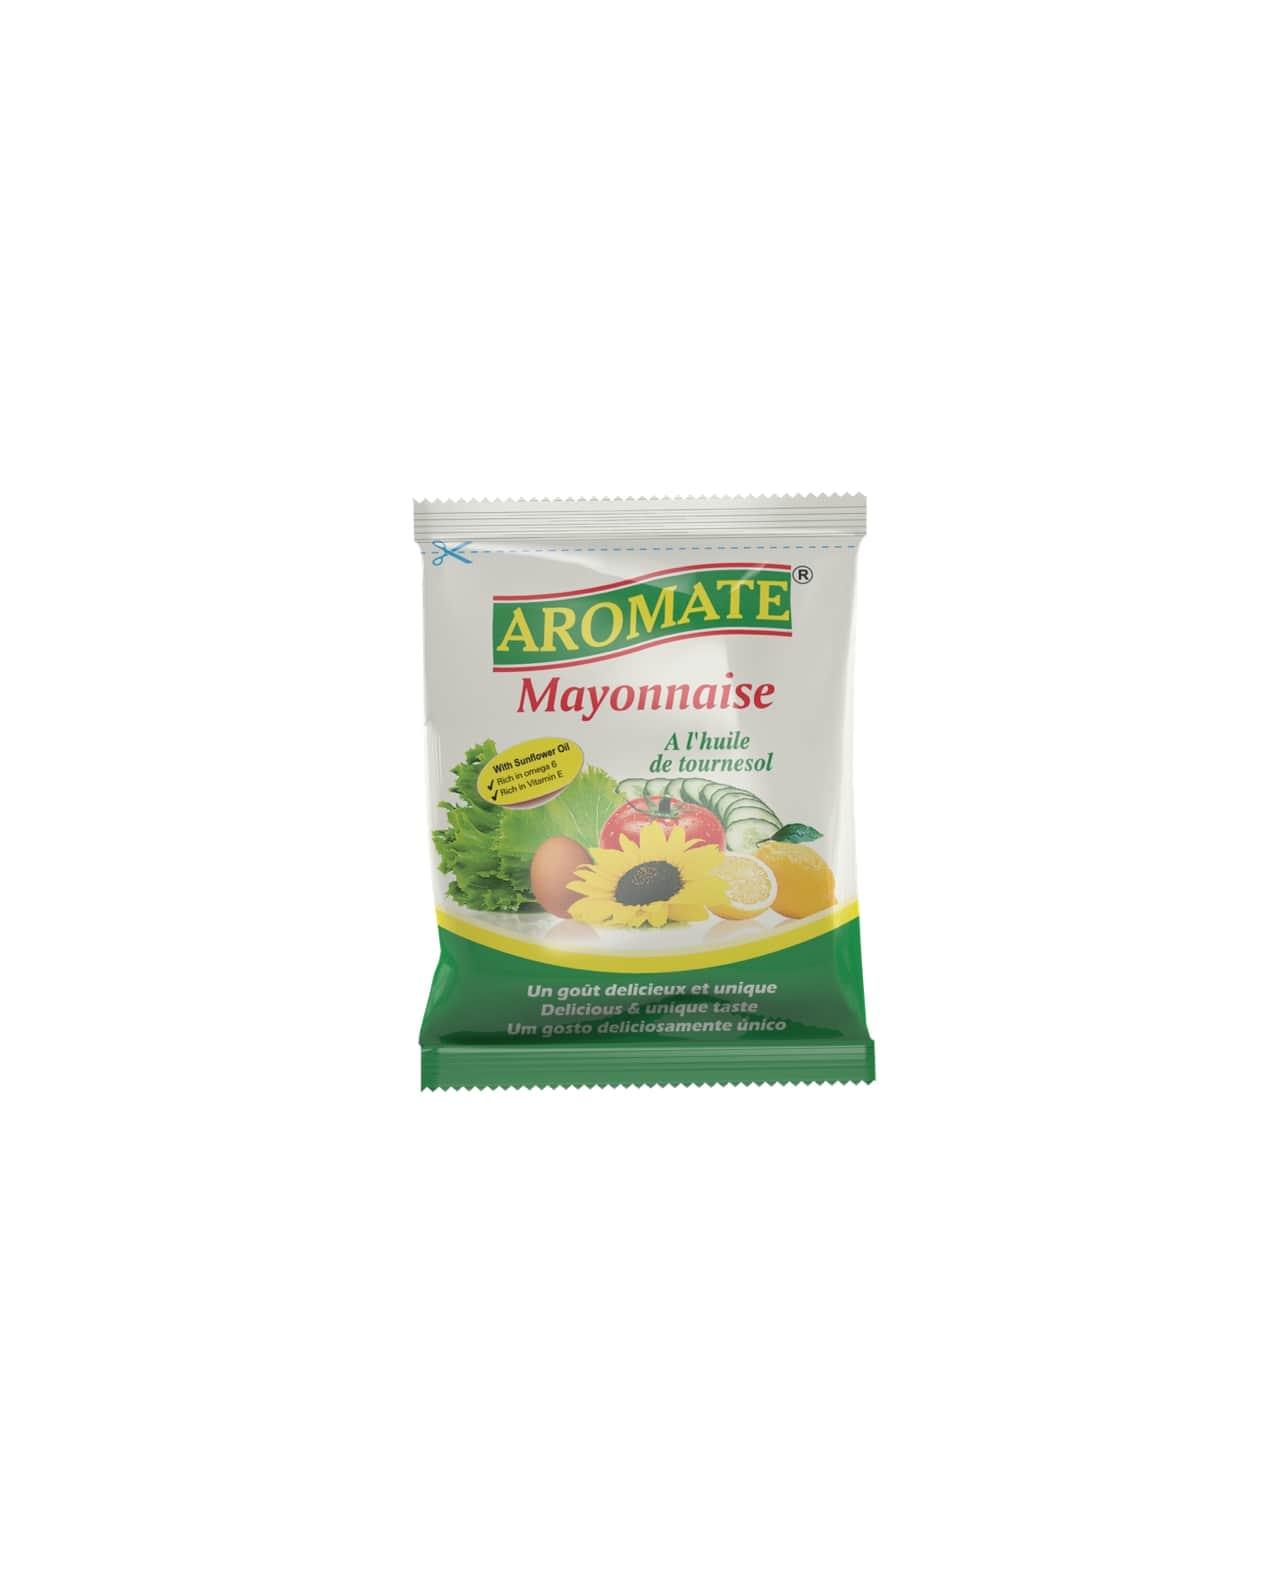 AROMATE Mayonnaise 25g